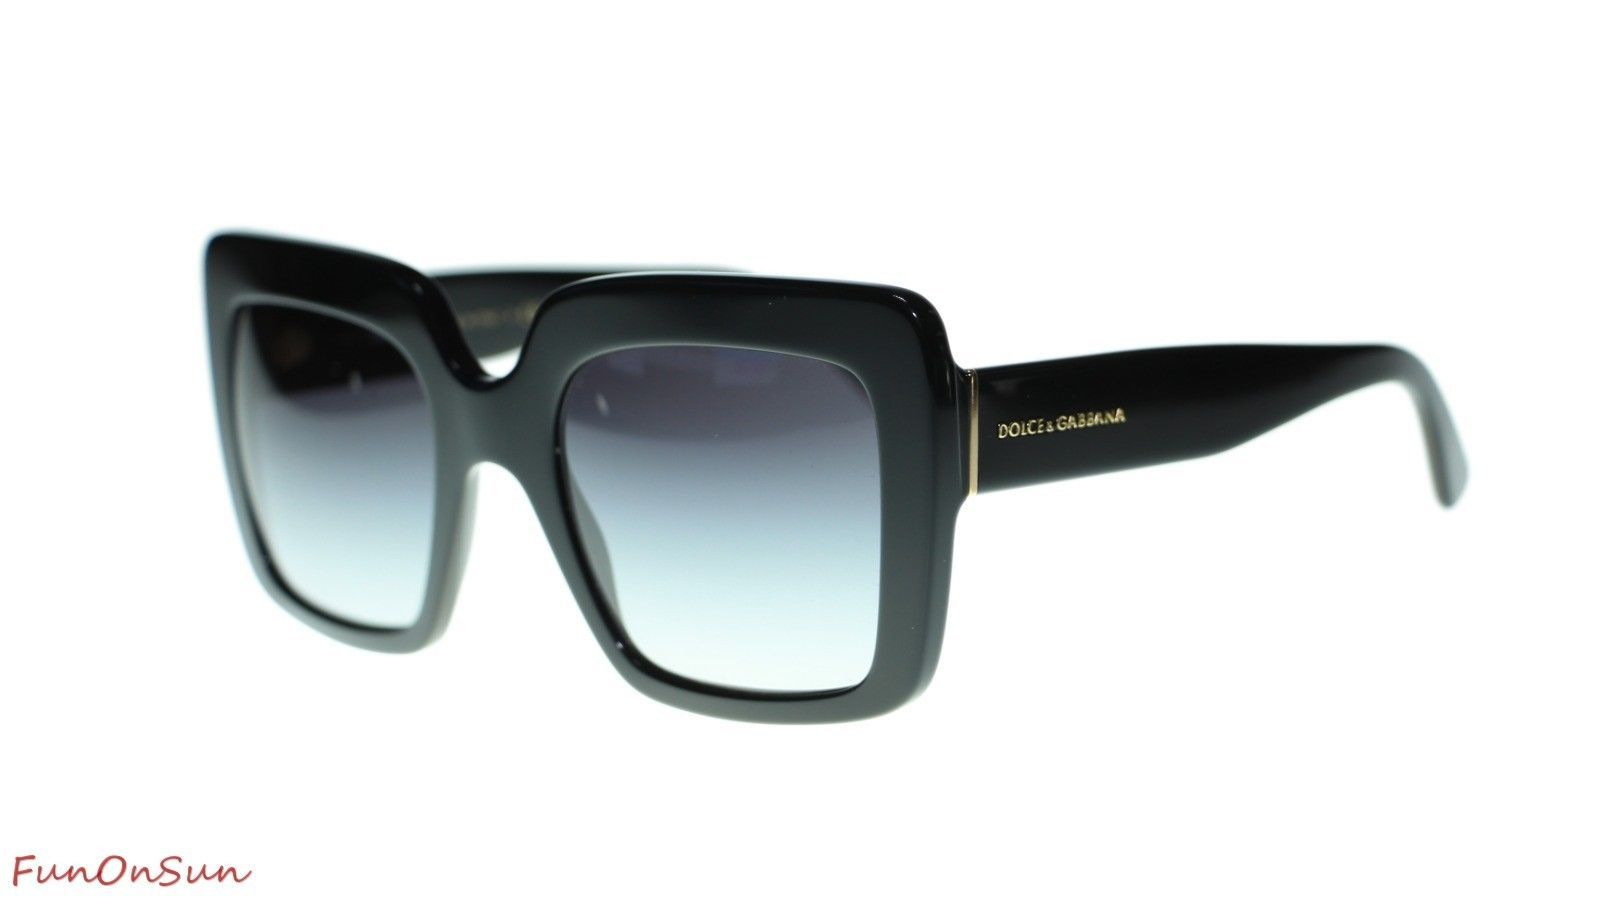 c45ebd329c9 10. 10. Previous. Dolce Gabbana Women Sunglasses DG4310 5018G Black Grey  Gradient Lens 52mm